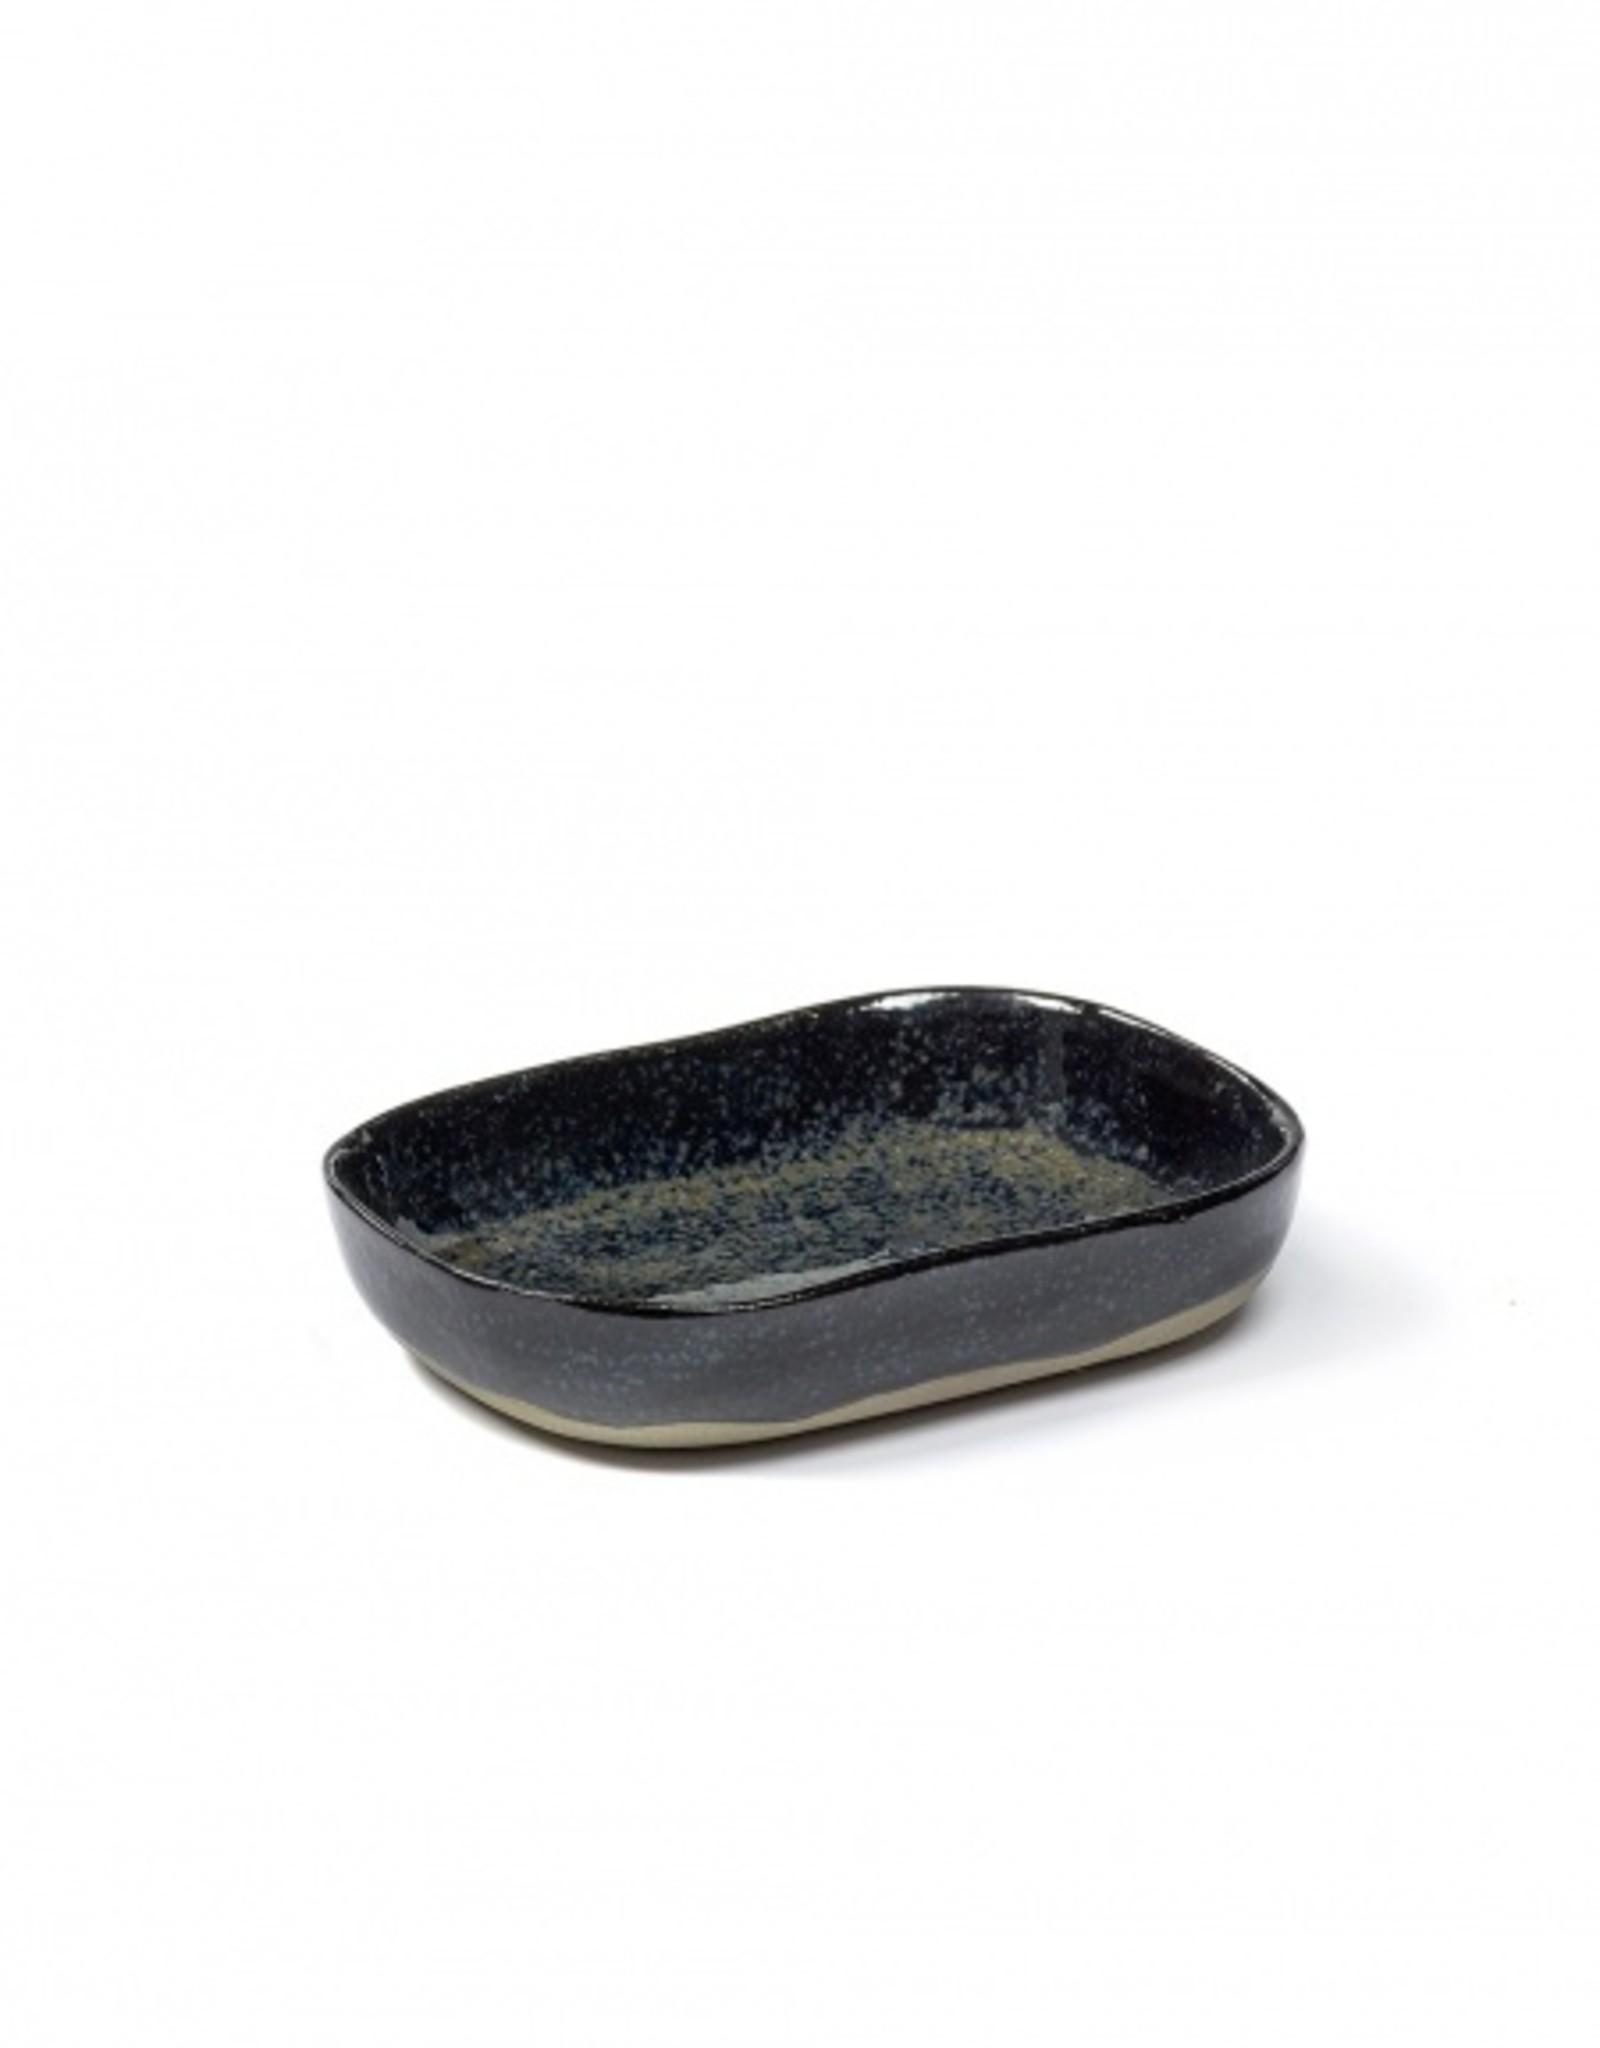 Serax Dark Blue Sandstone No 7 Deep Plate